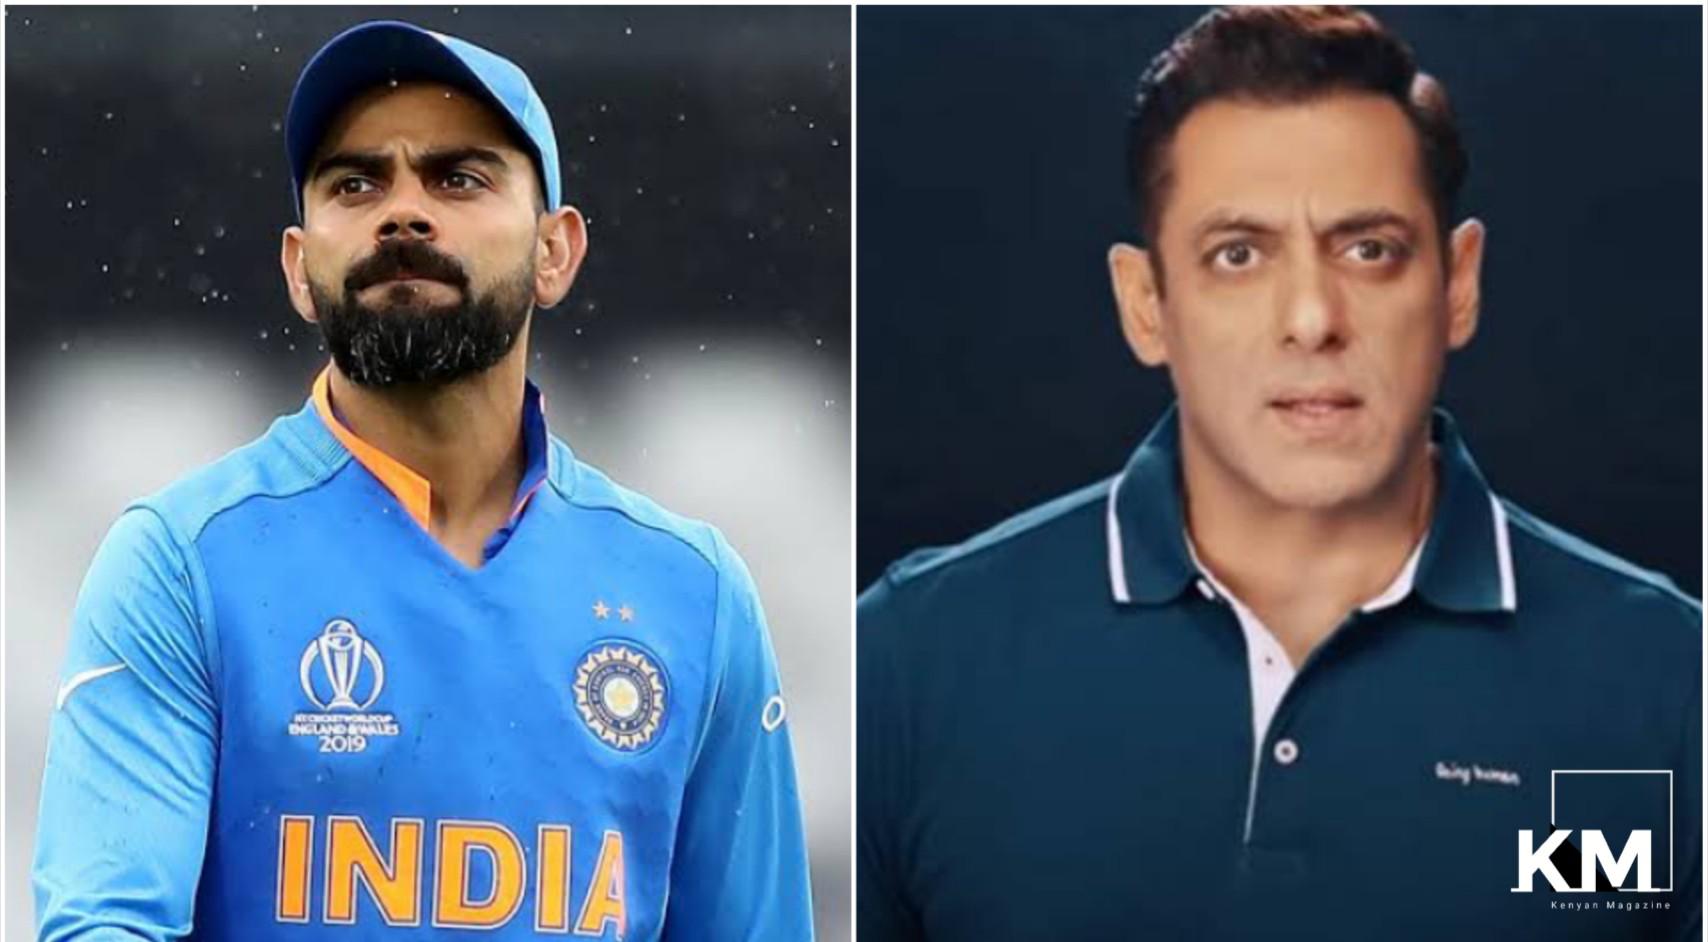 Richest Celebrities In India